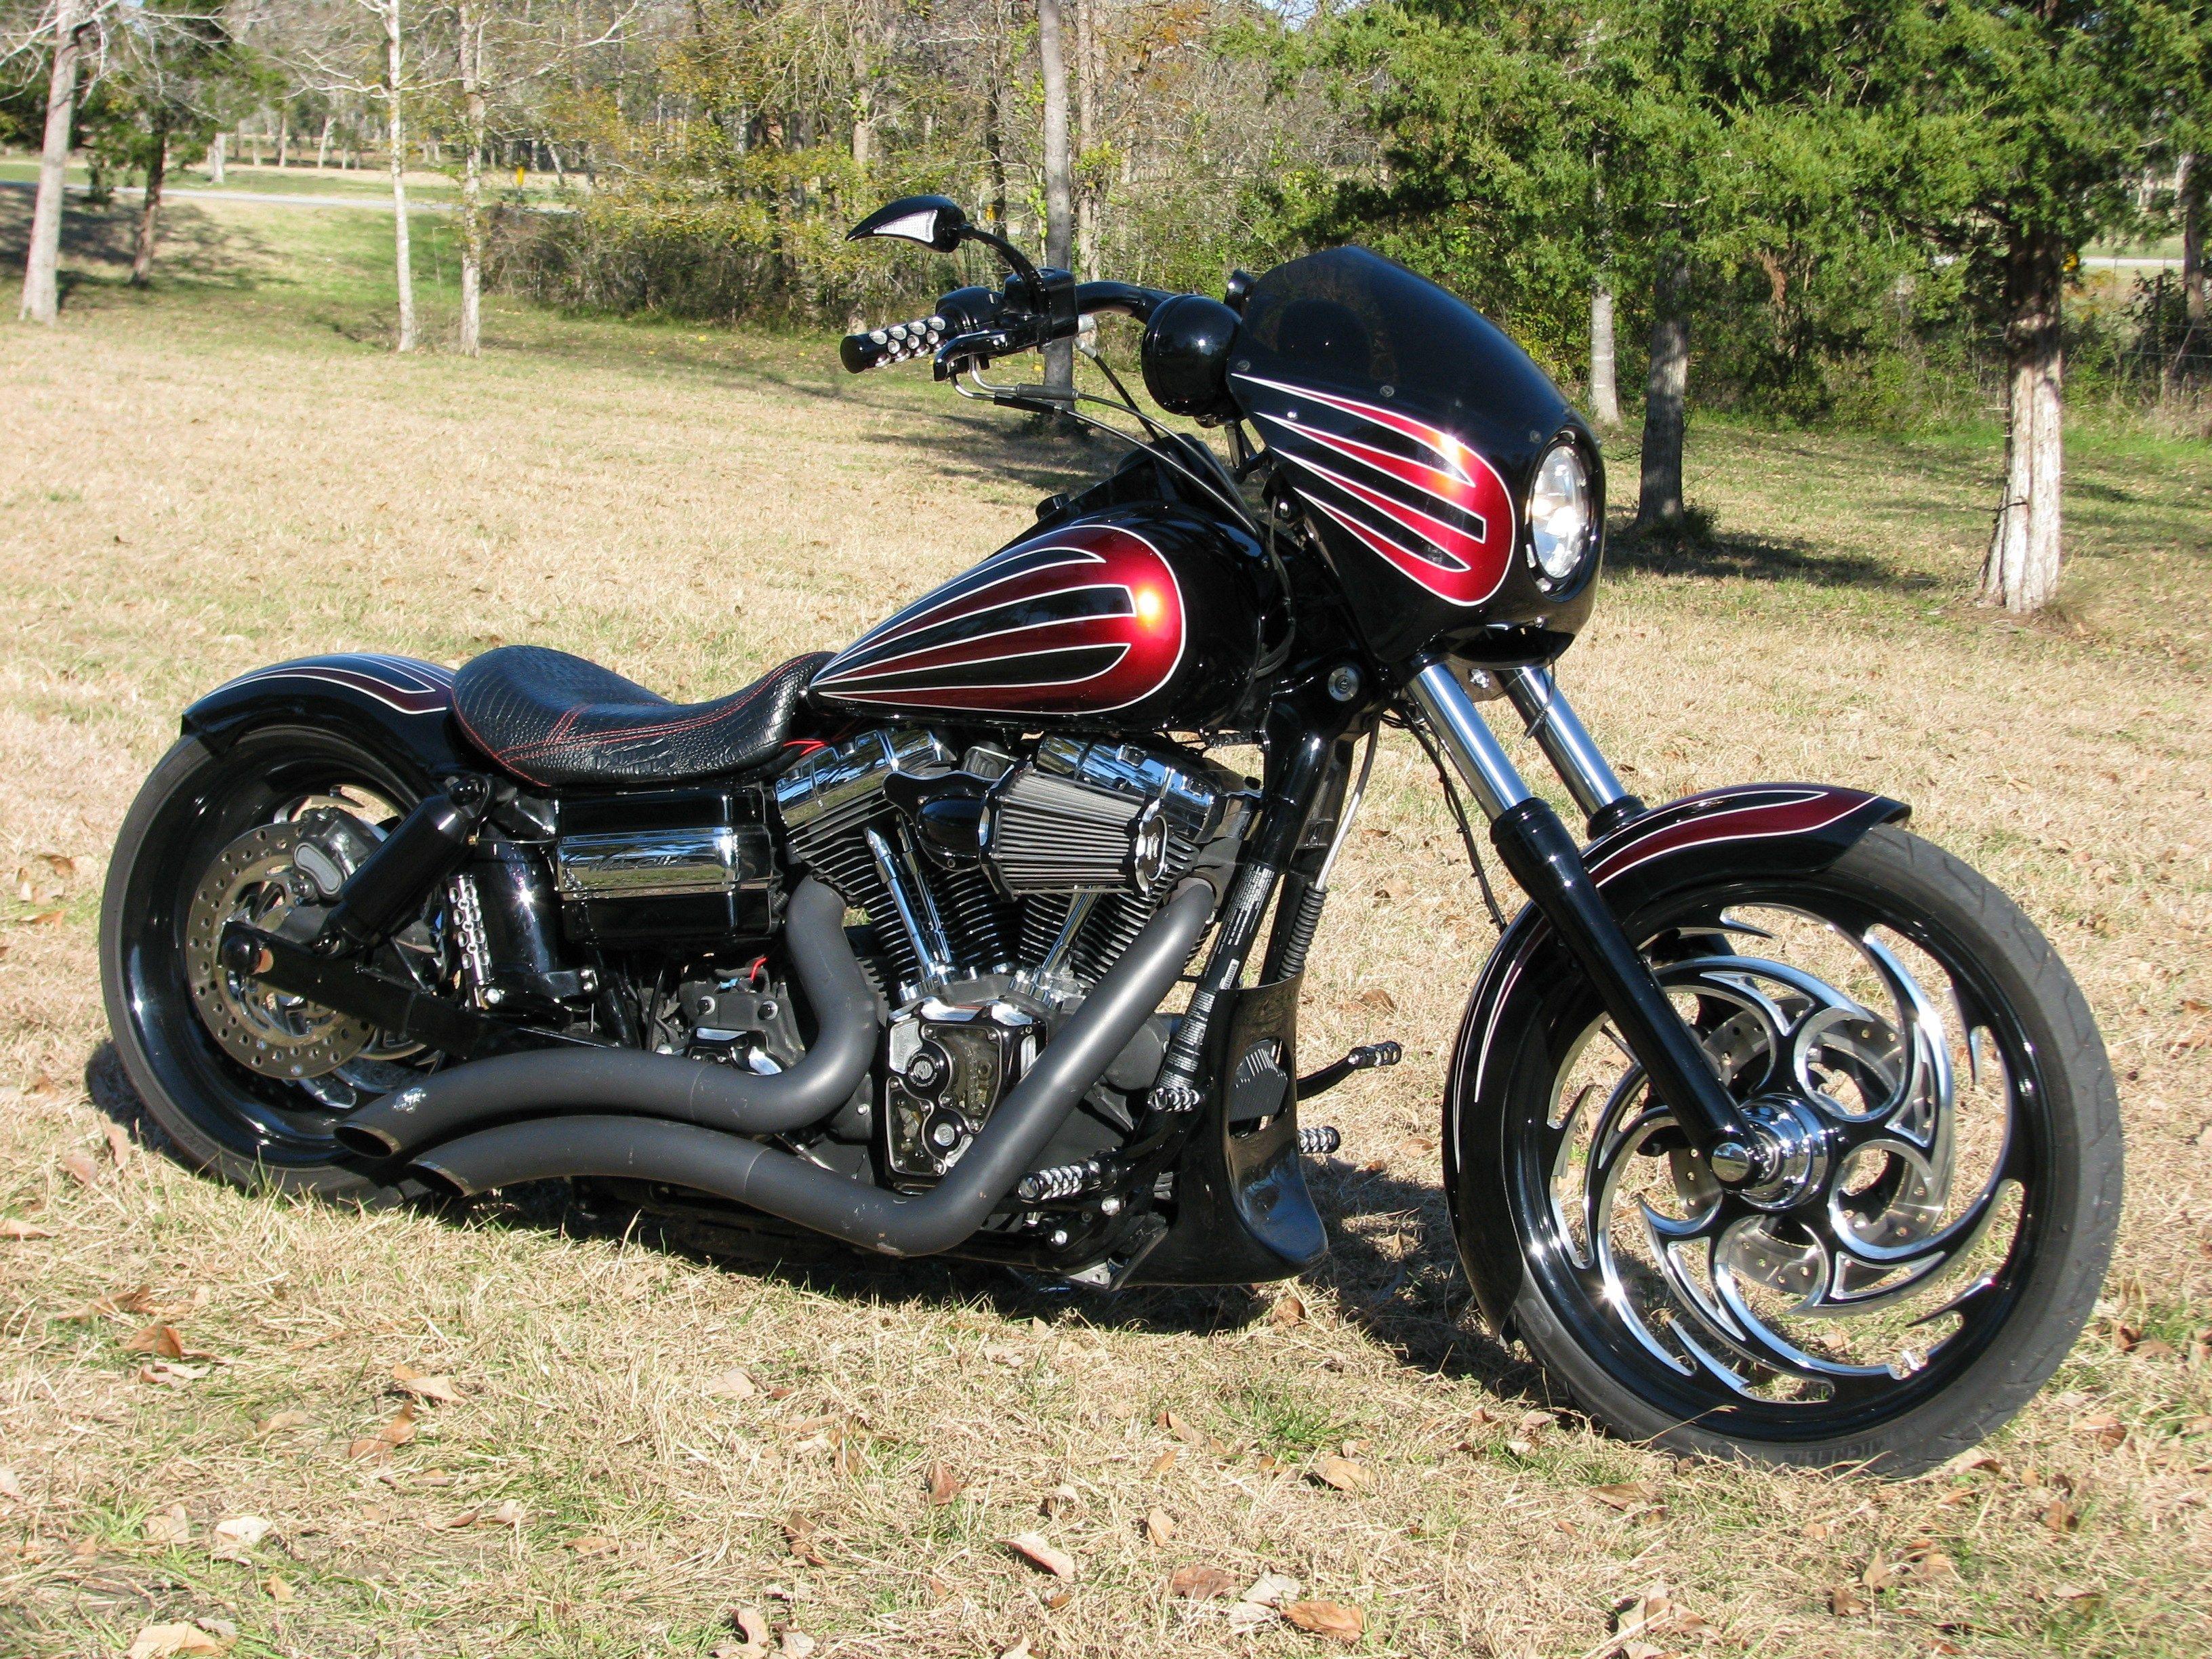 Sick Custom Dyna Wide Glide: 2013 Harley-Davidson® FXDWG Dyna® Wide Glide (Black